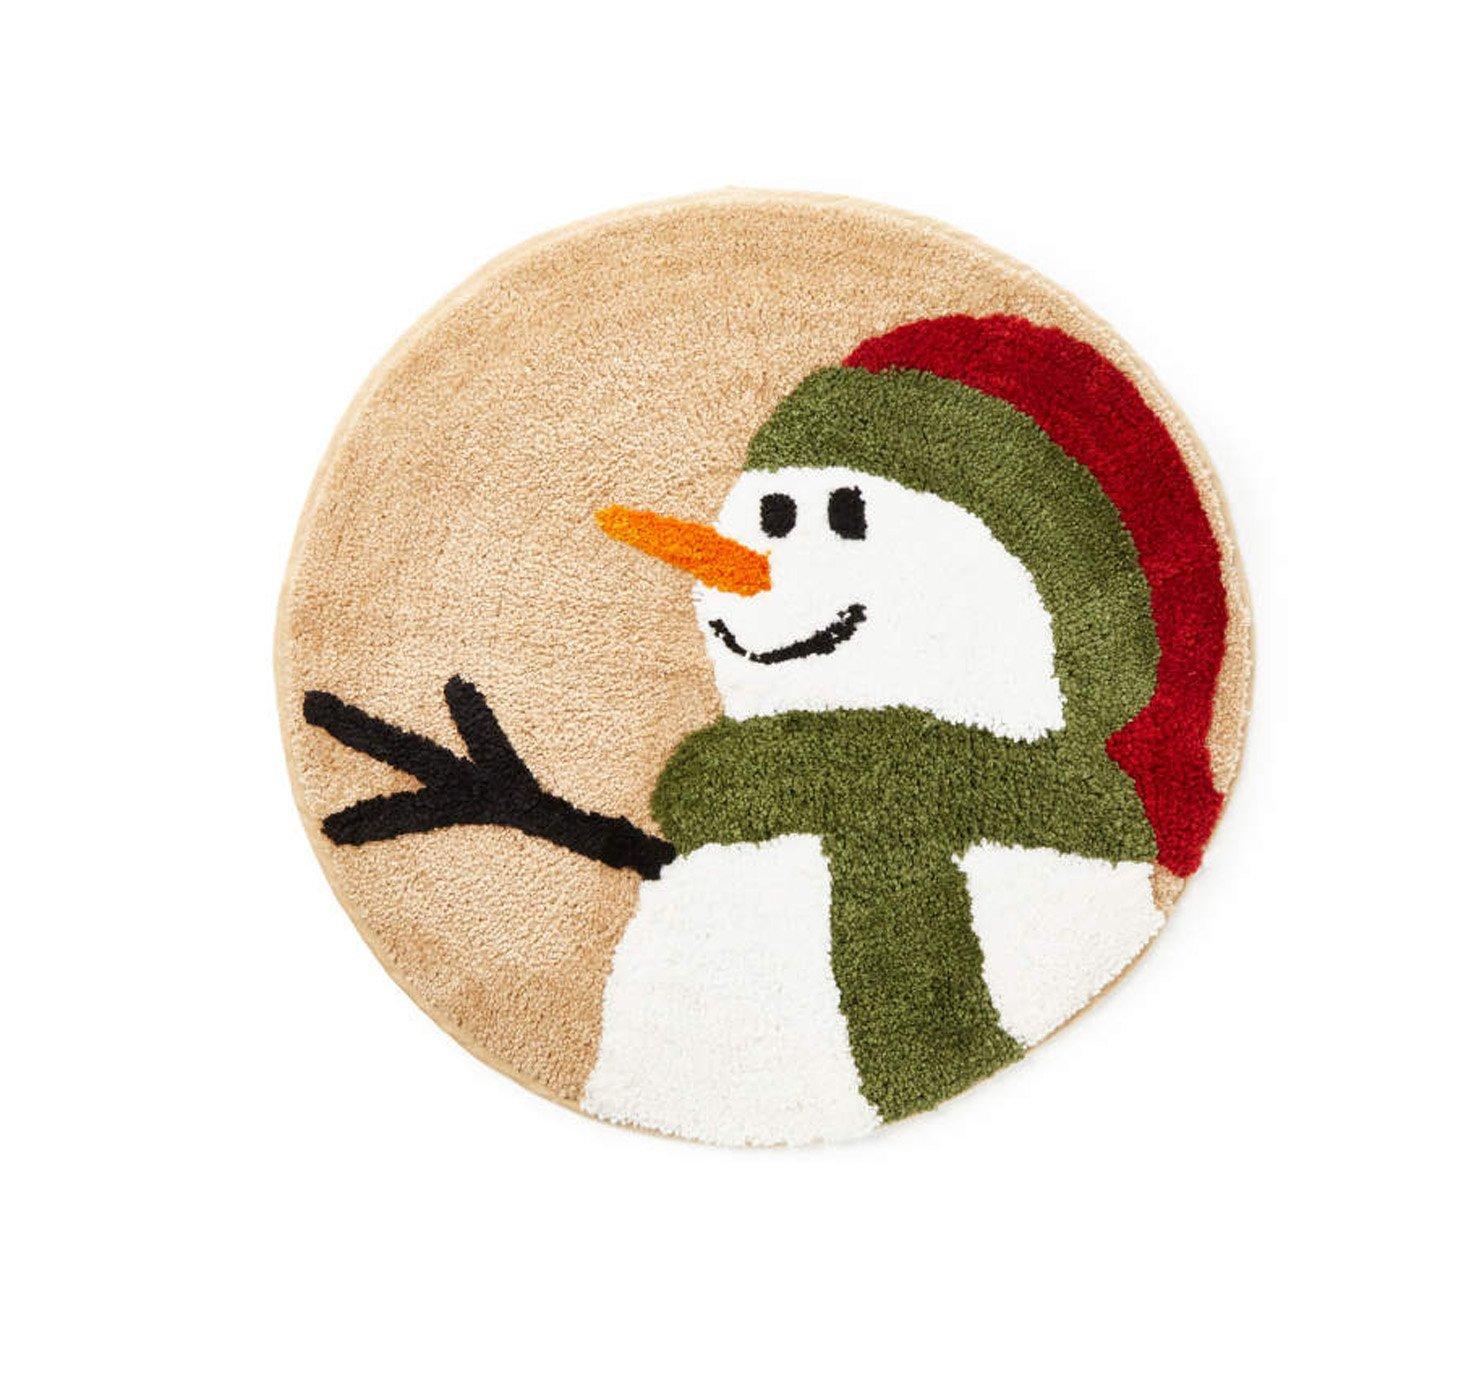 Winter Wonder Lane Rustic Snowman Land Bathroom Rug Plush 25 Inches Round